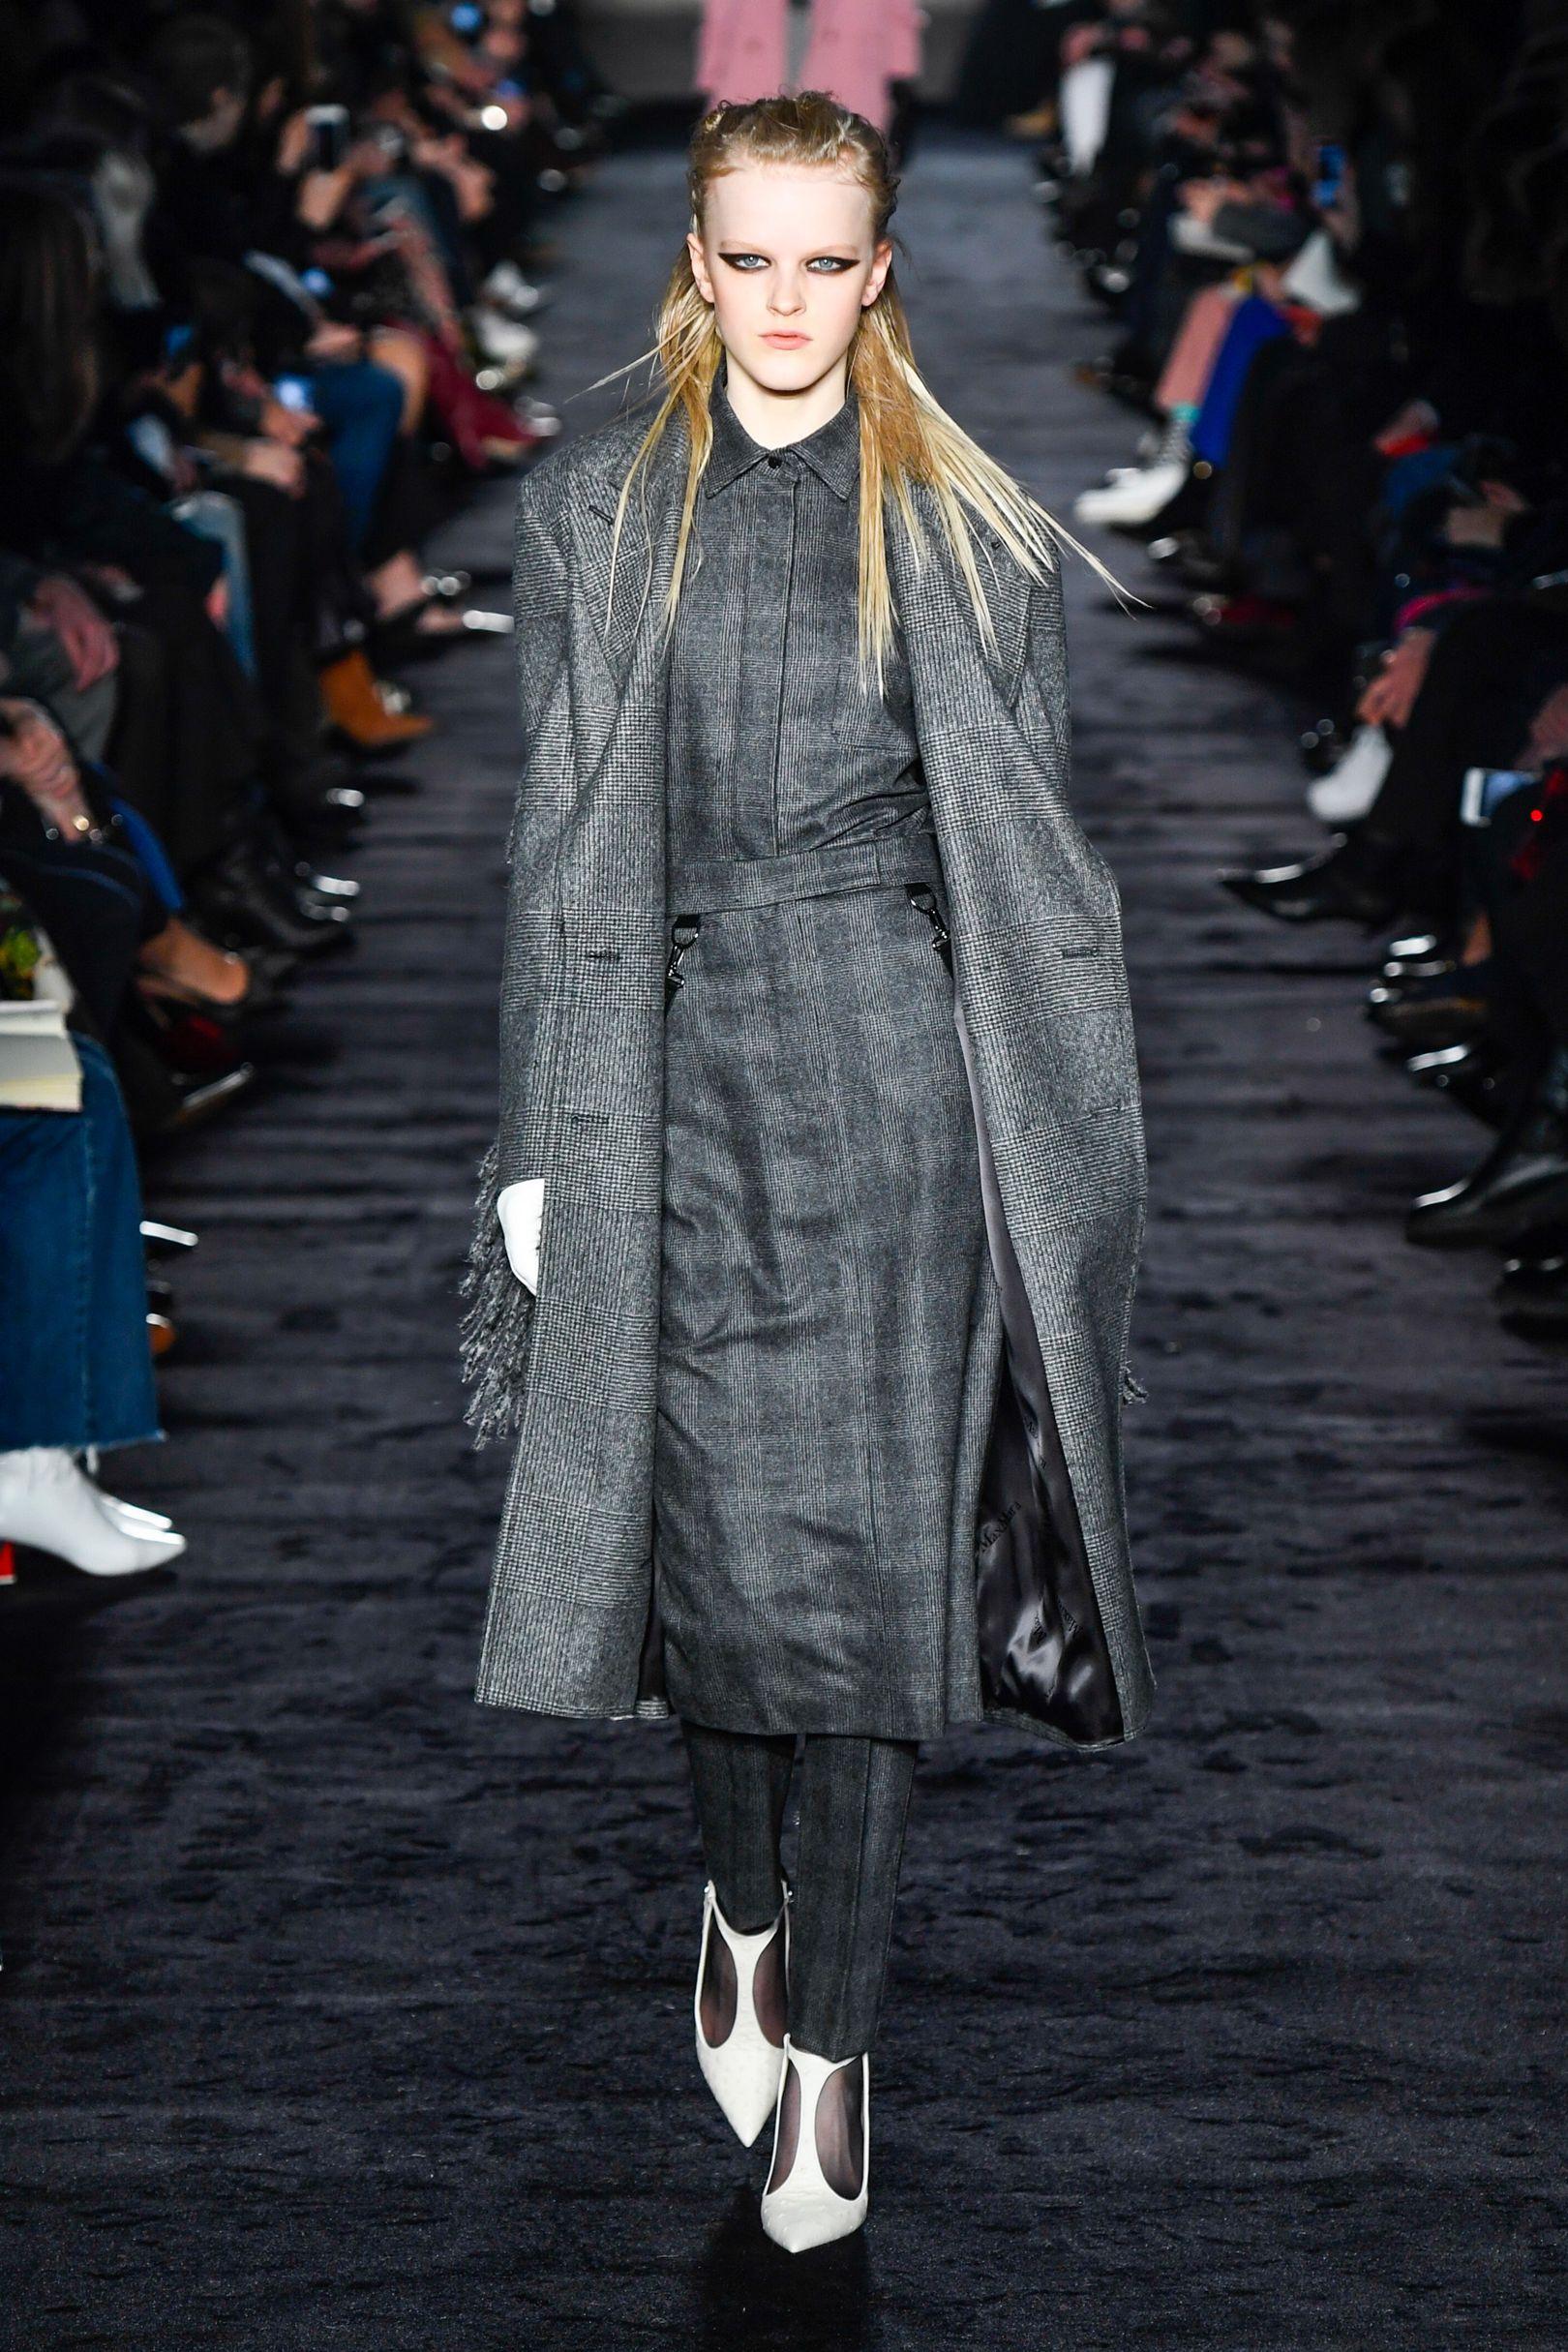 Max Mara Autumn Winter 2018 Ready To Wear  2f923632fc2